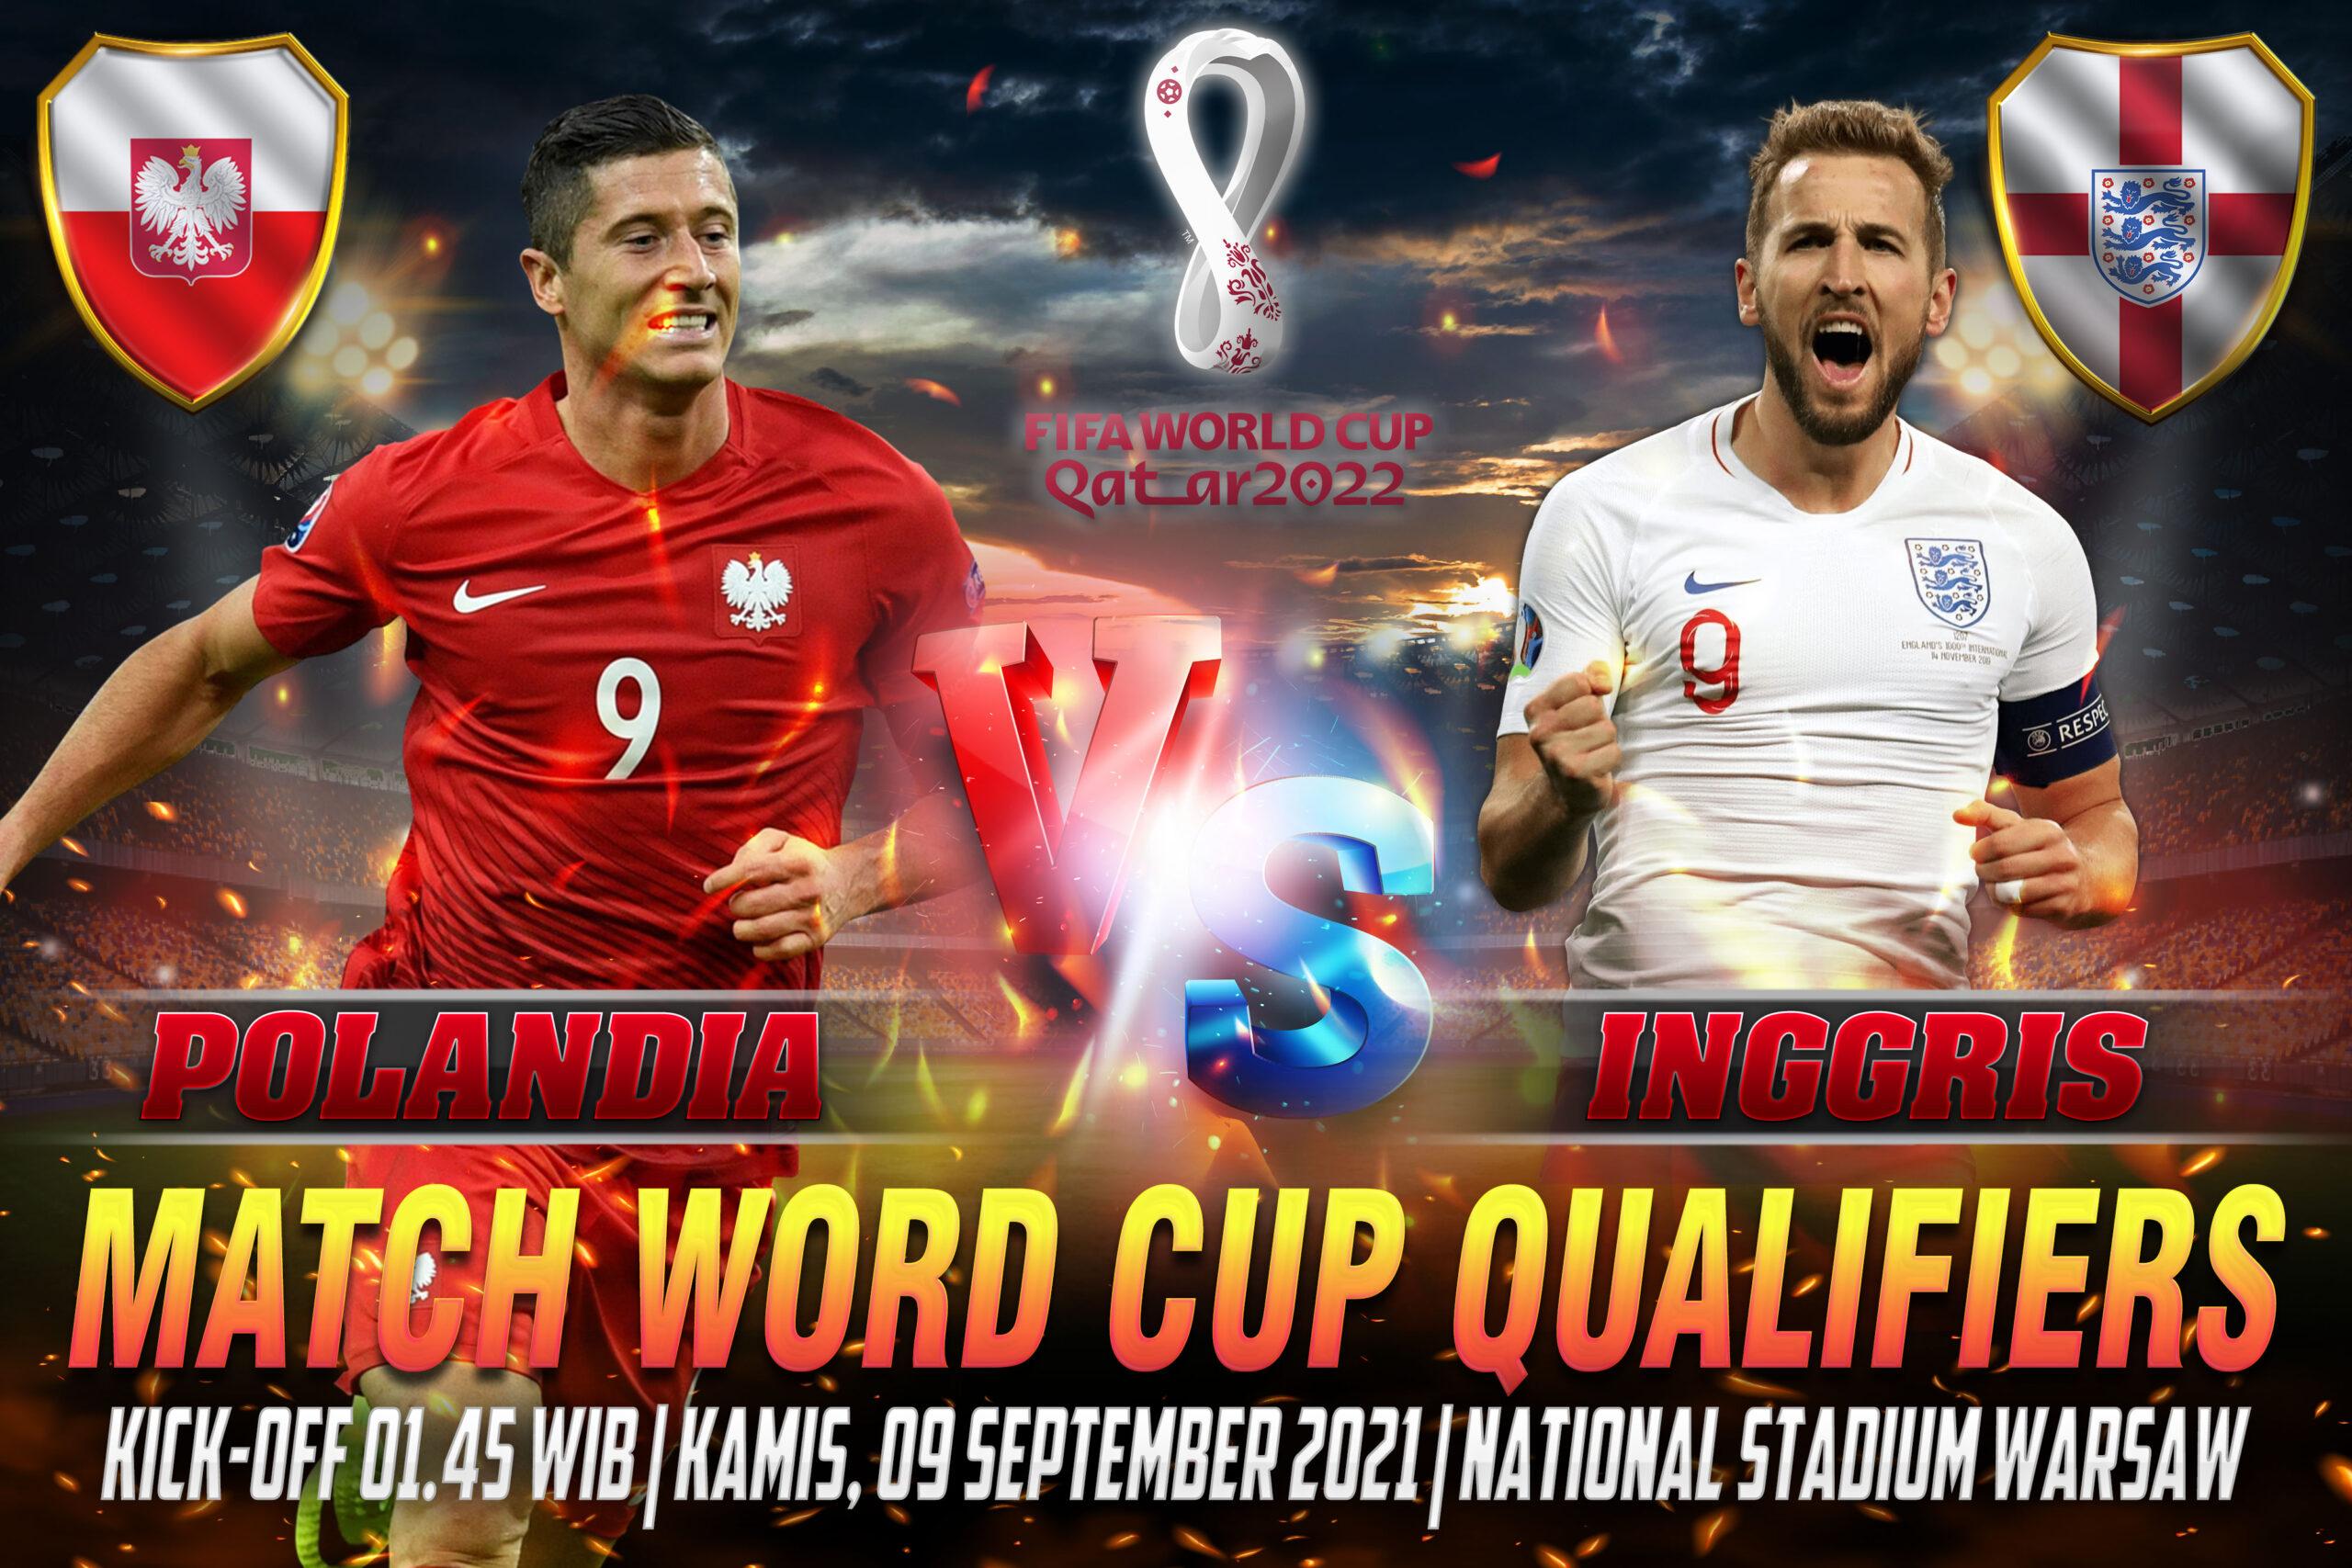 Prediksi Skor Polandia vs Inggris Word Cup Qualifiers